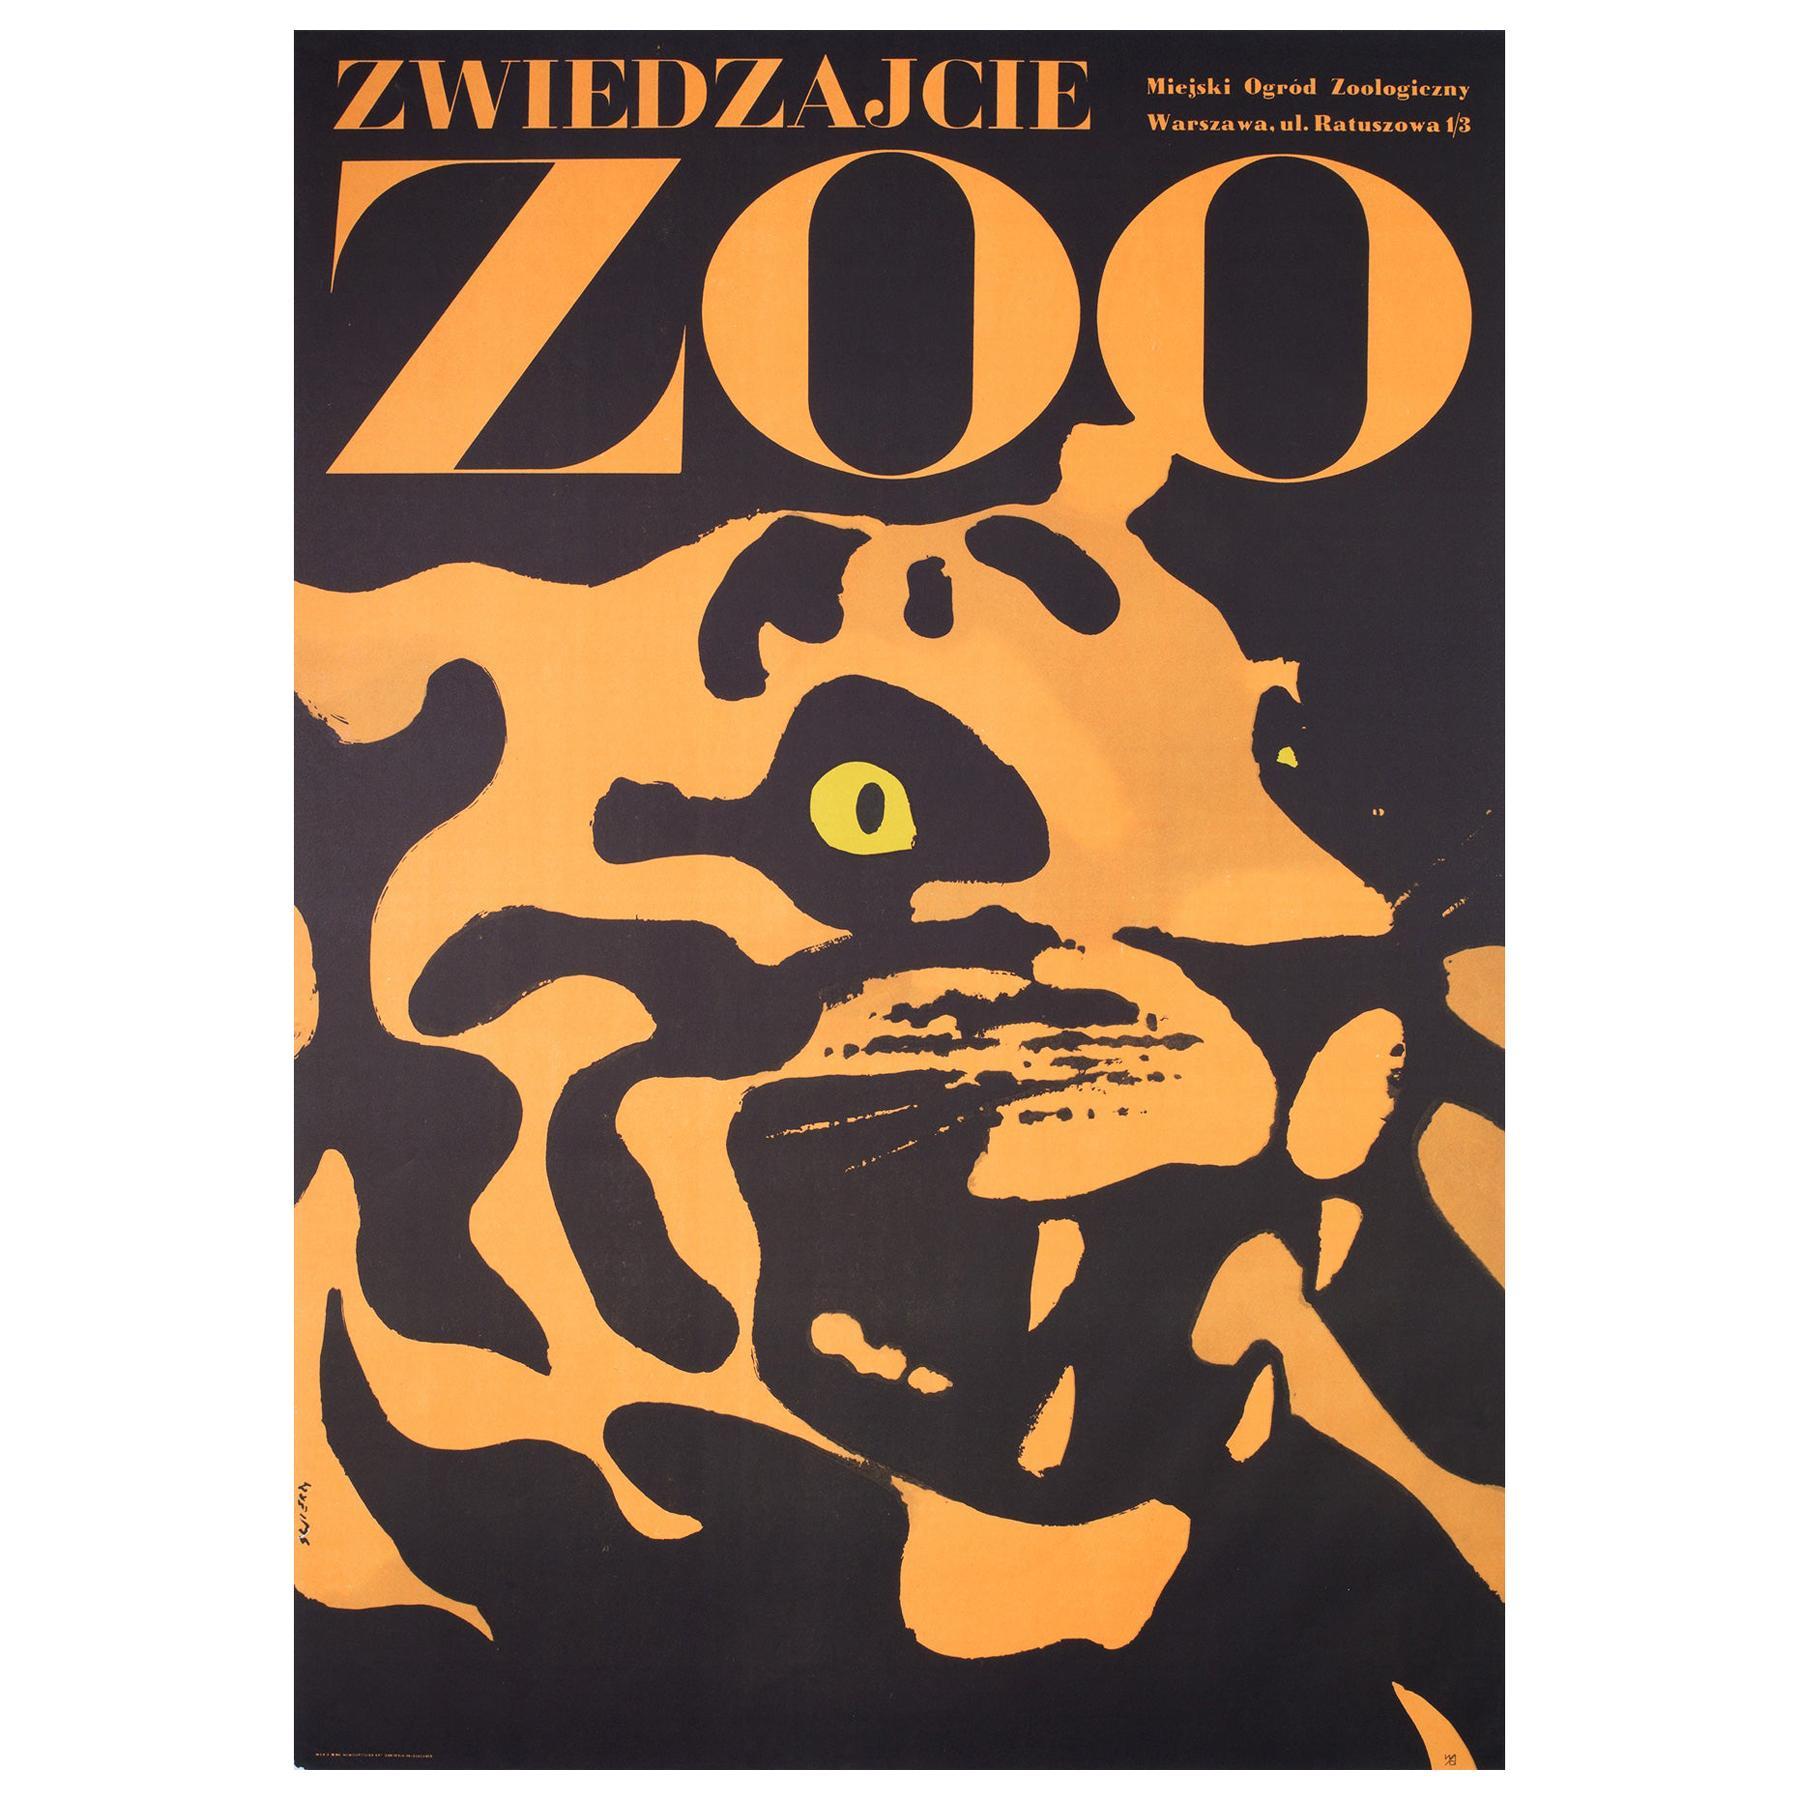 Tiger, Polish, Zoo, Poster, 1967, Vintage, Waldemar Swierzy, Black and Orange